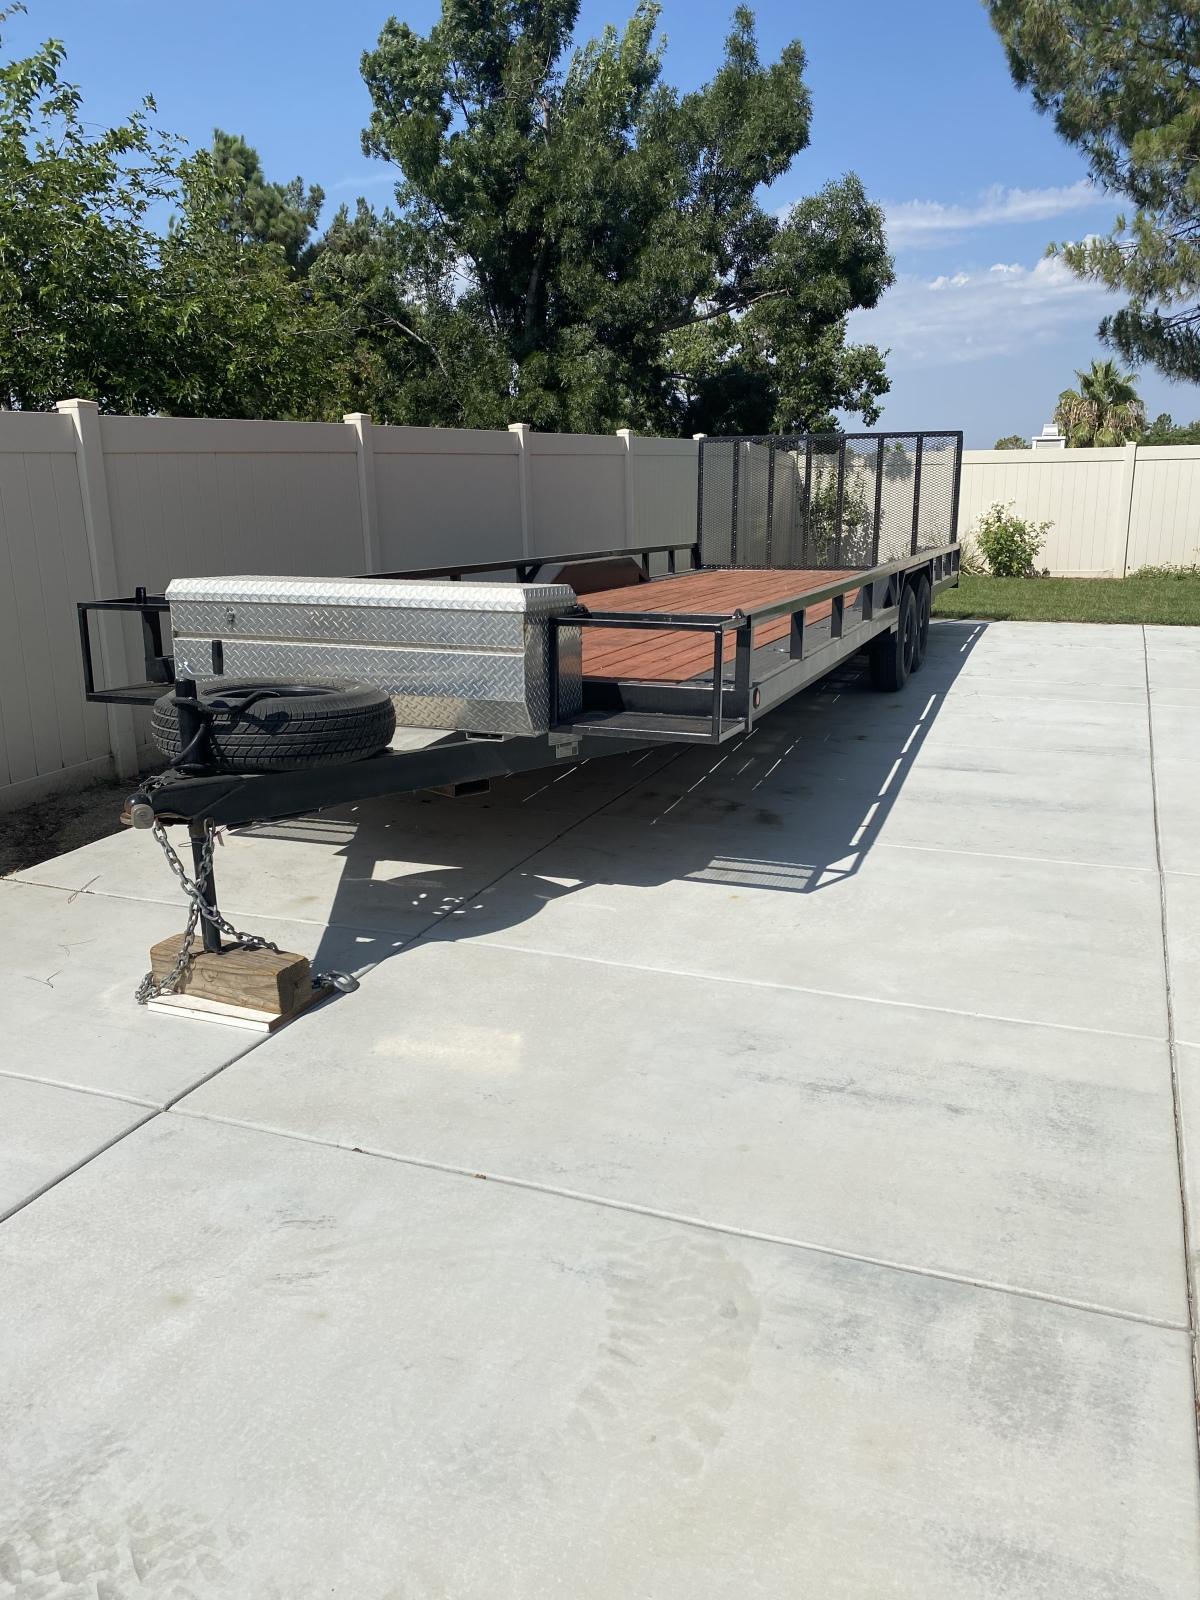 For Sale: 2020 sky trailer  - photo0